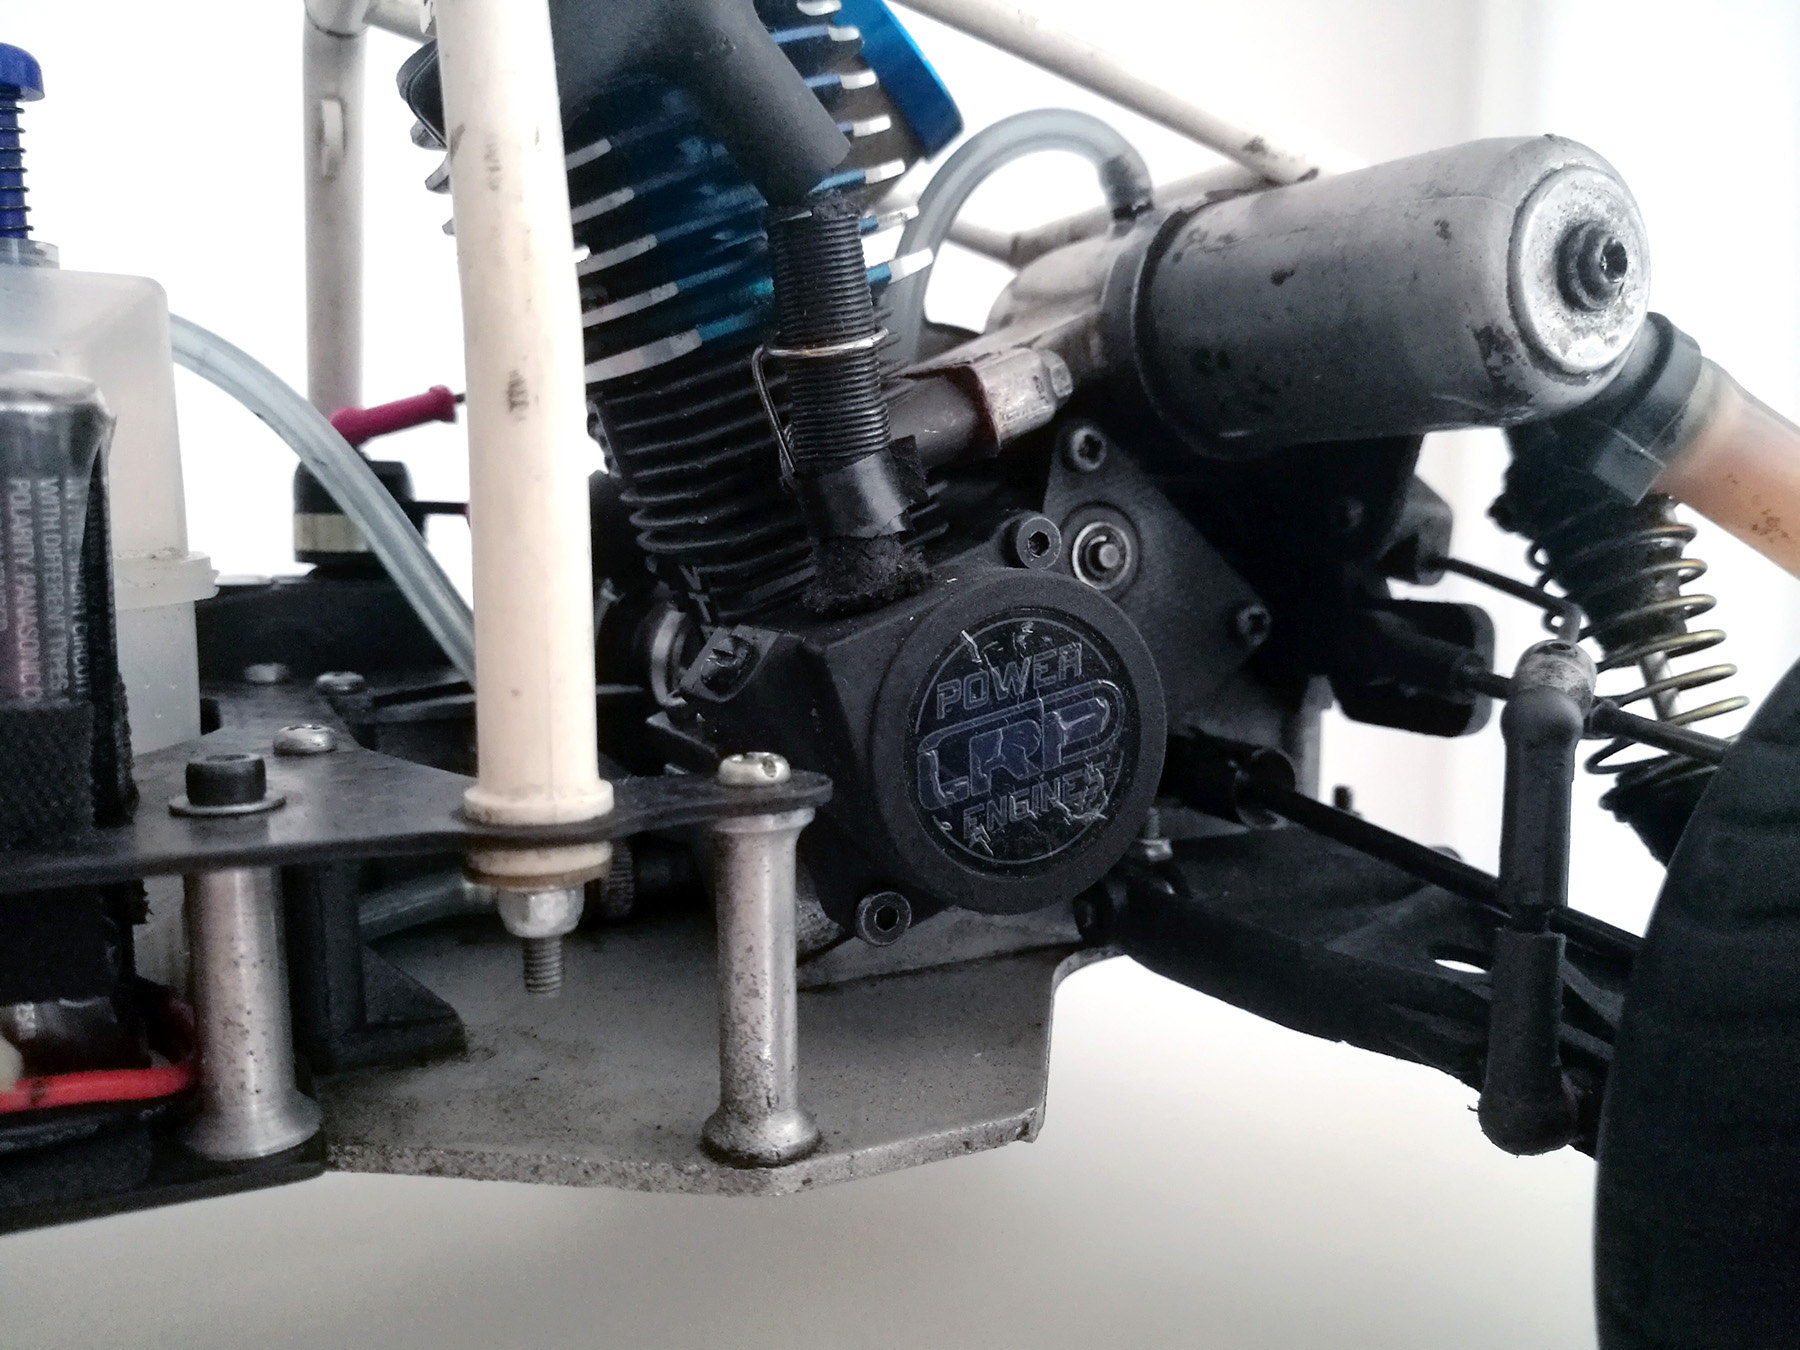 tamiya wrenchdog tr-15t lrp 18 tnx tgm conversion